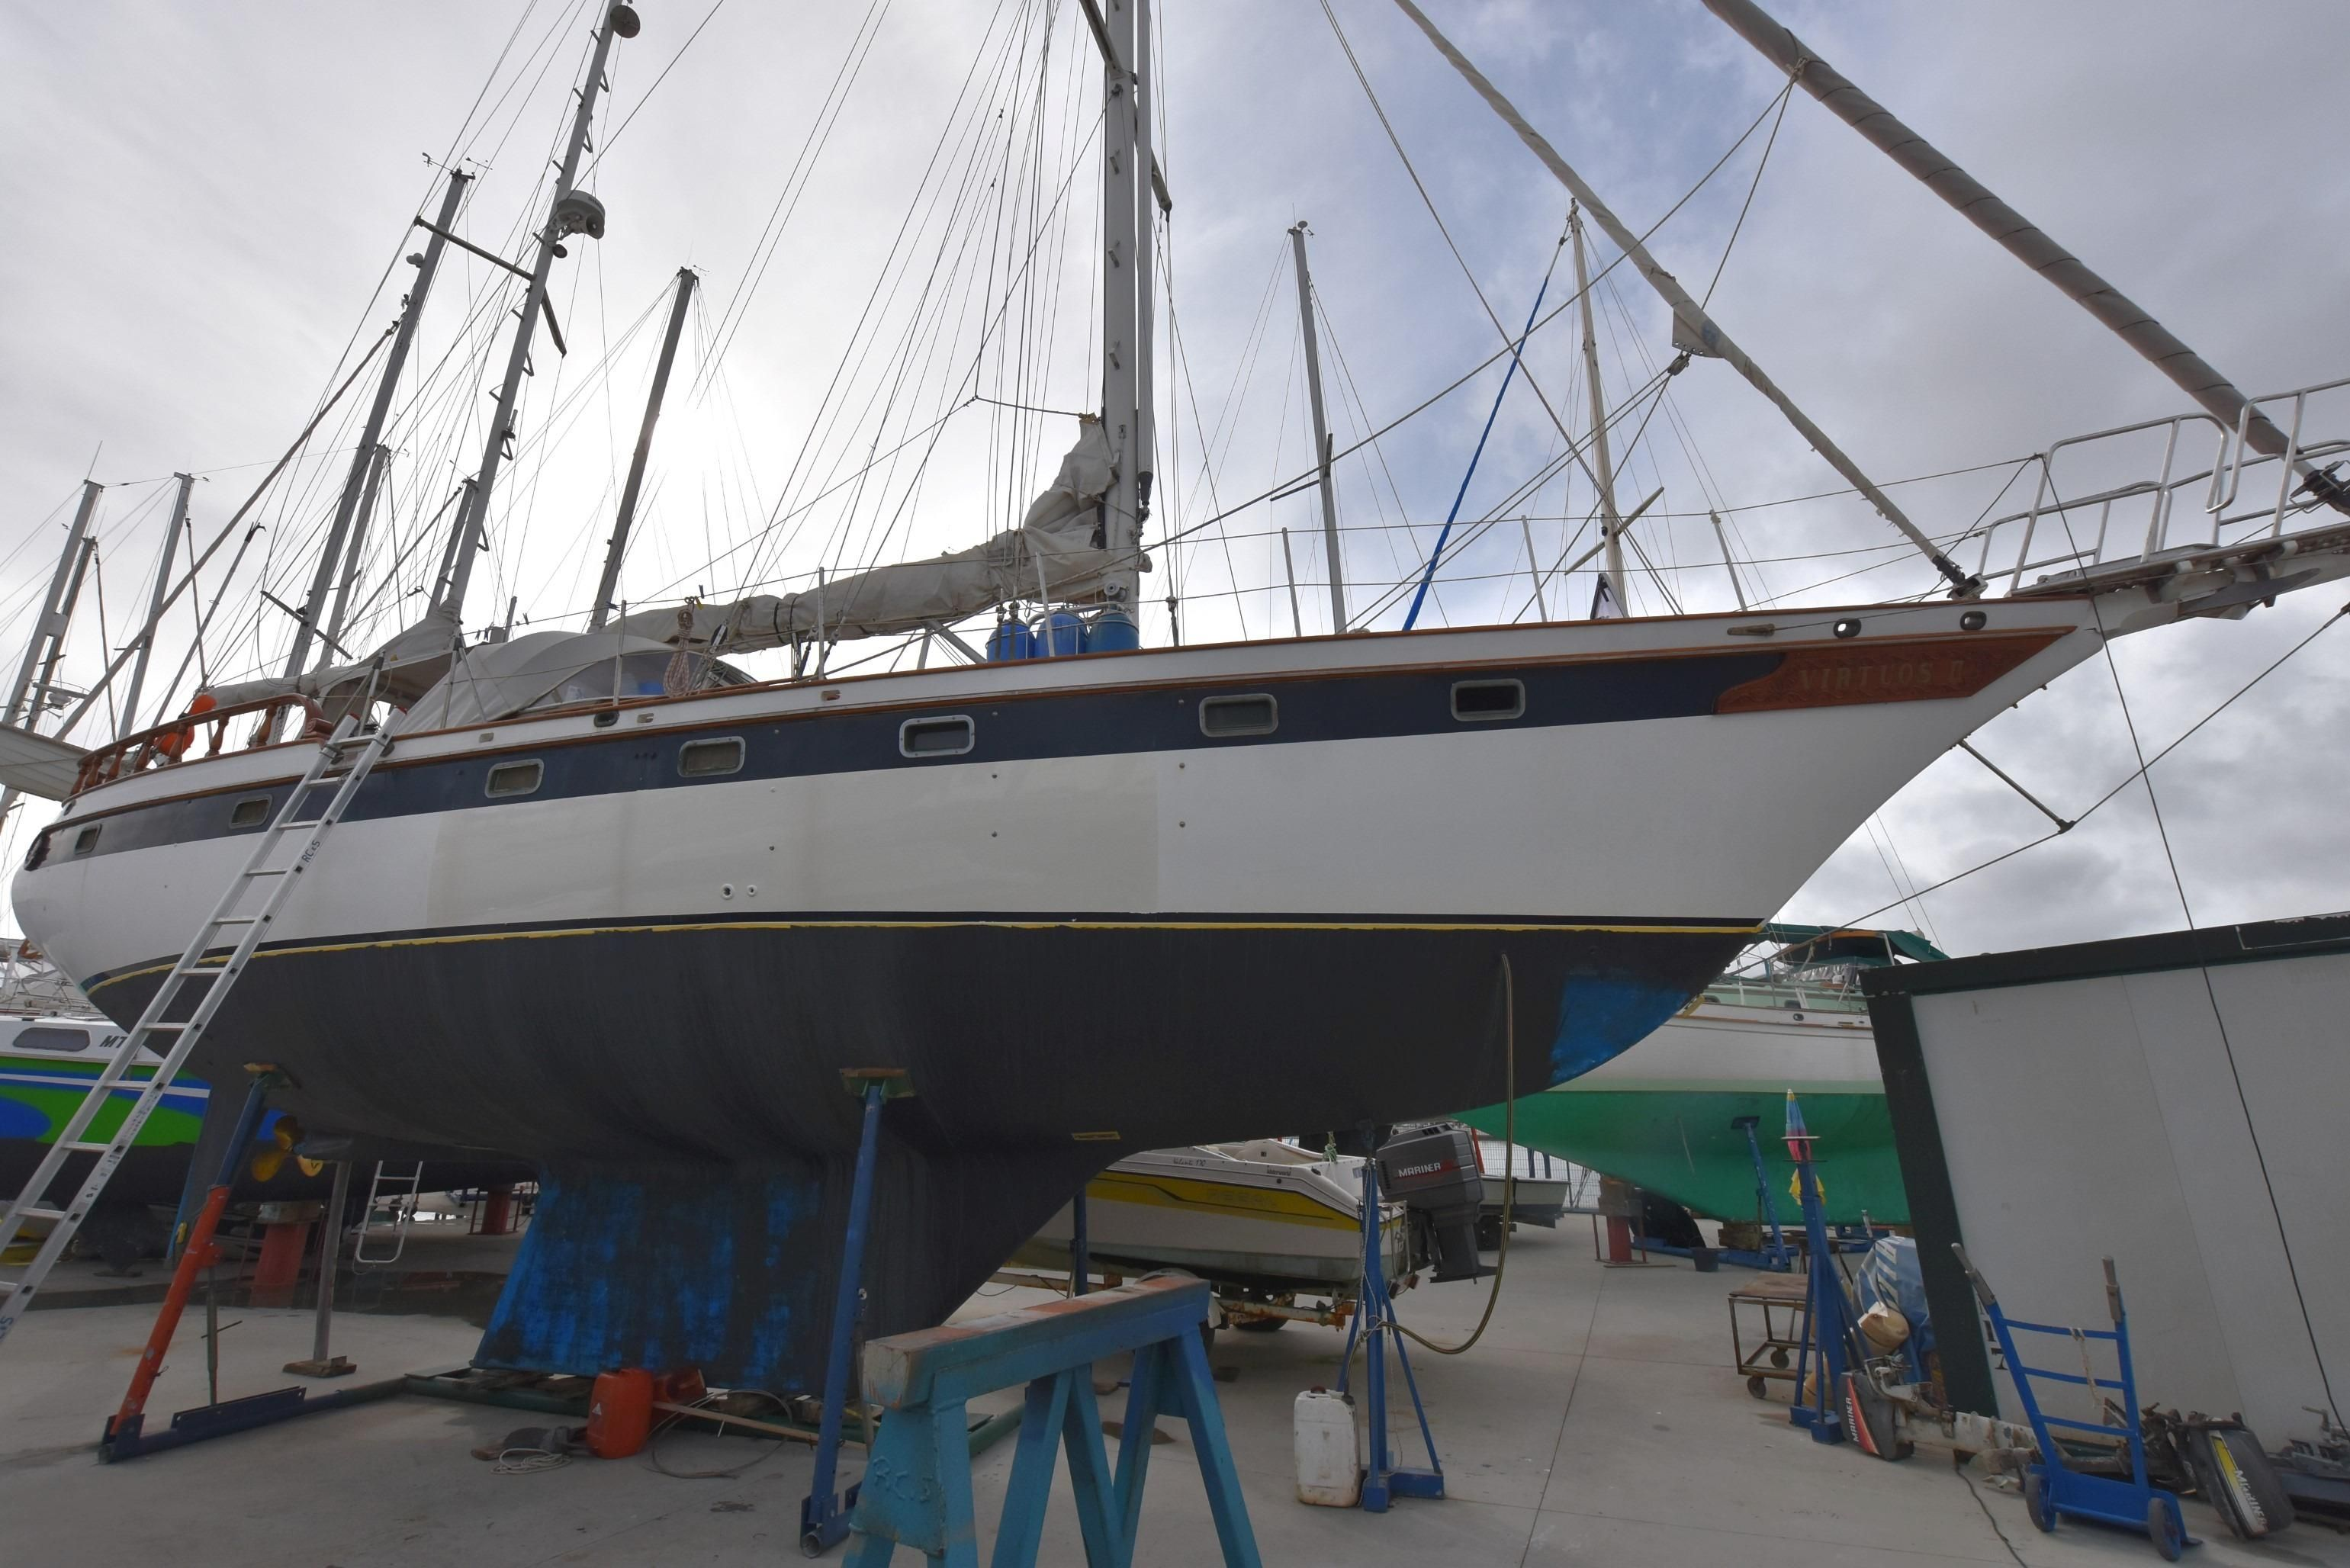 1982 Formosa 47 Sail Boat For Sale Www Yachtworld Com